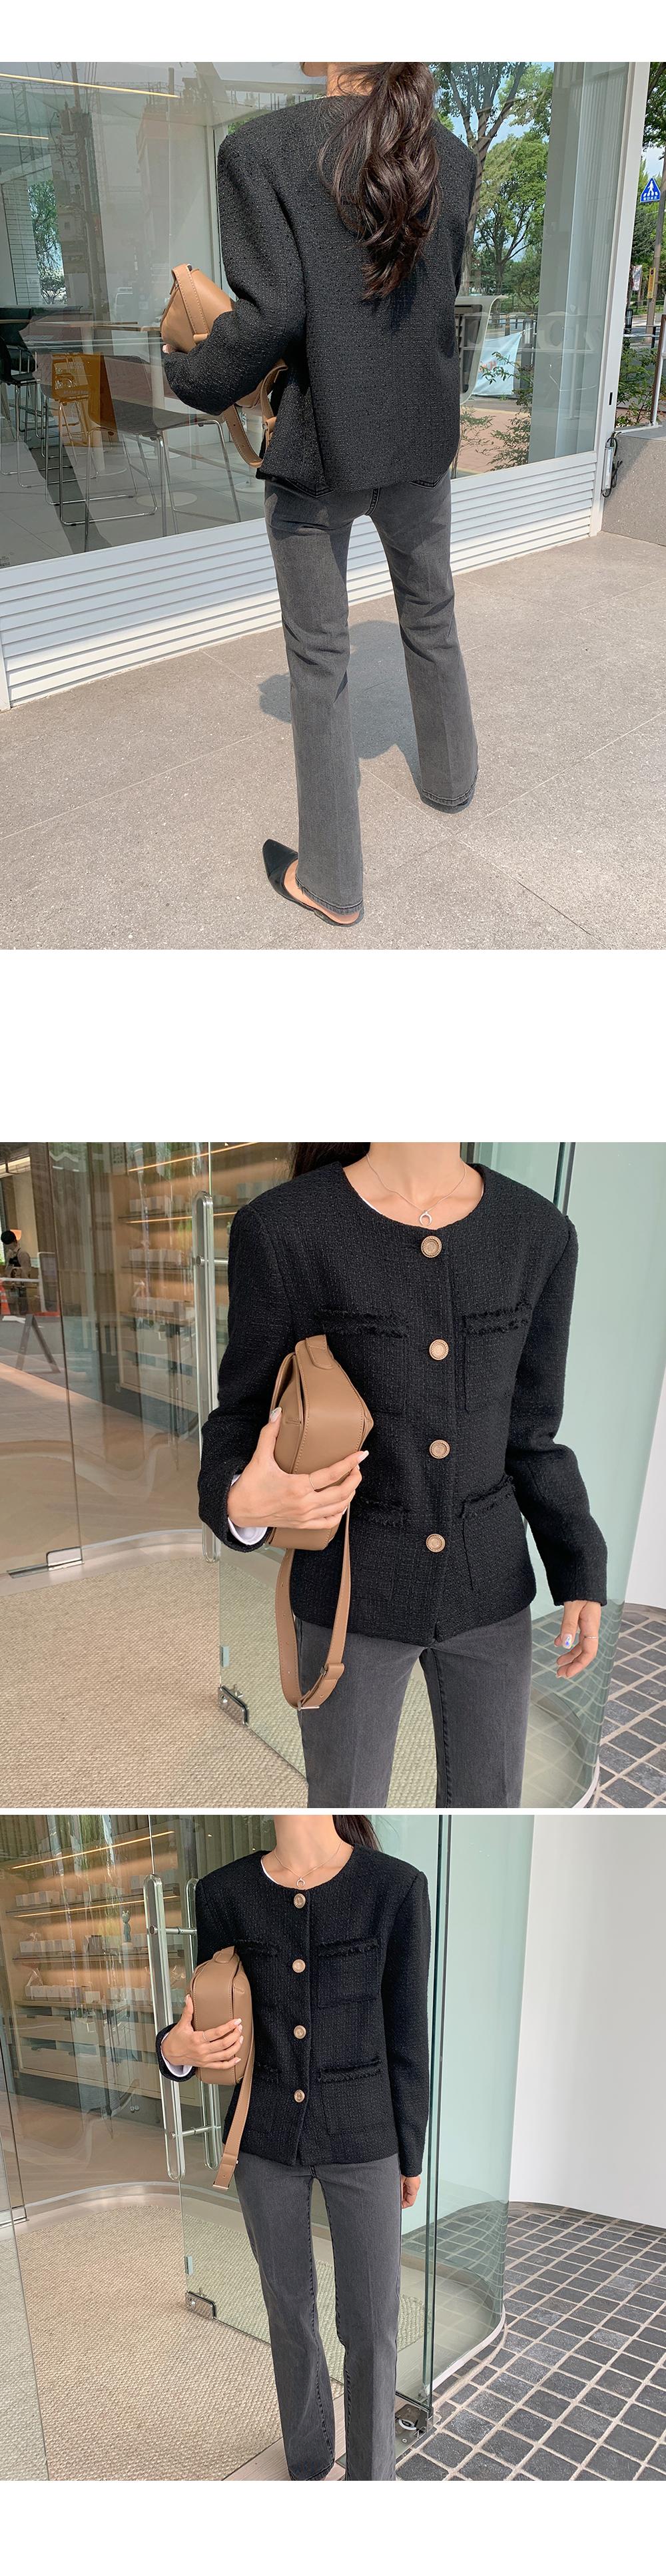 Scoop Neck Tweed Jacket-holiholi.com